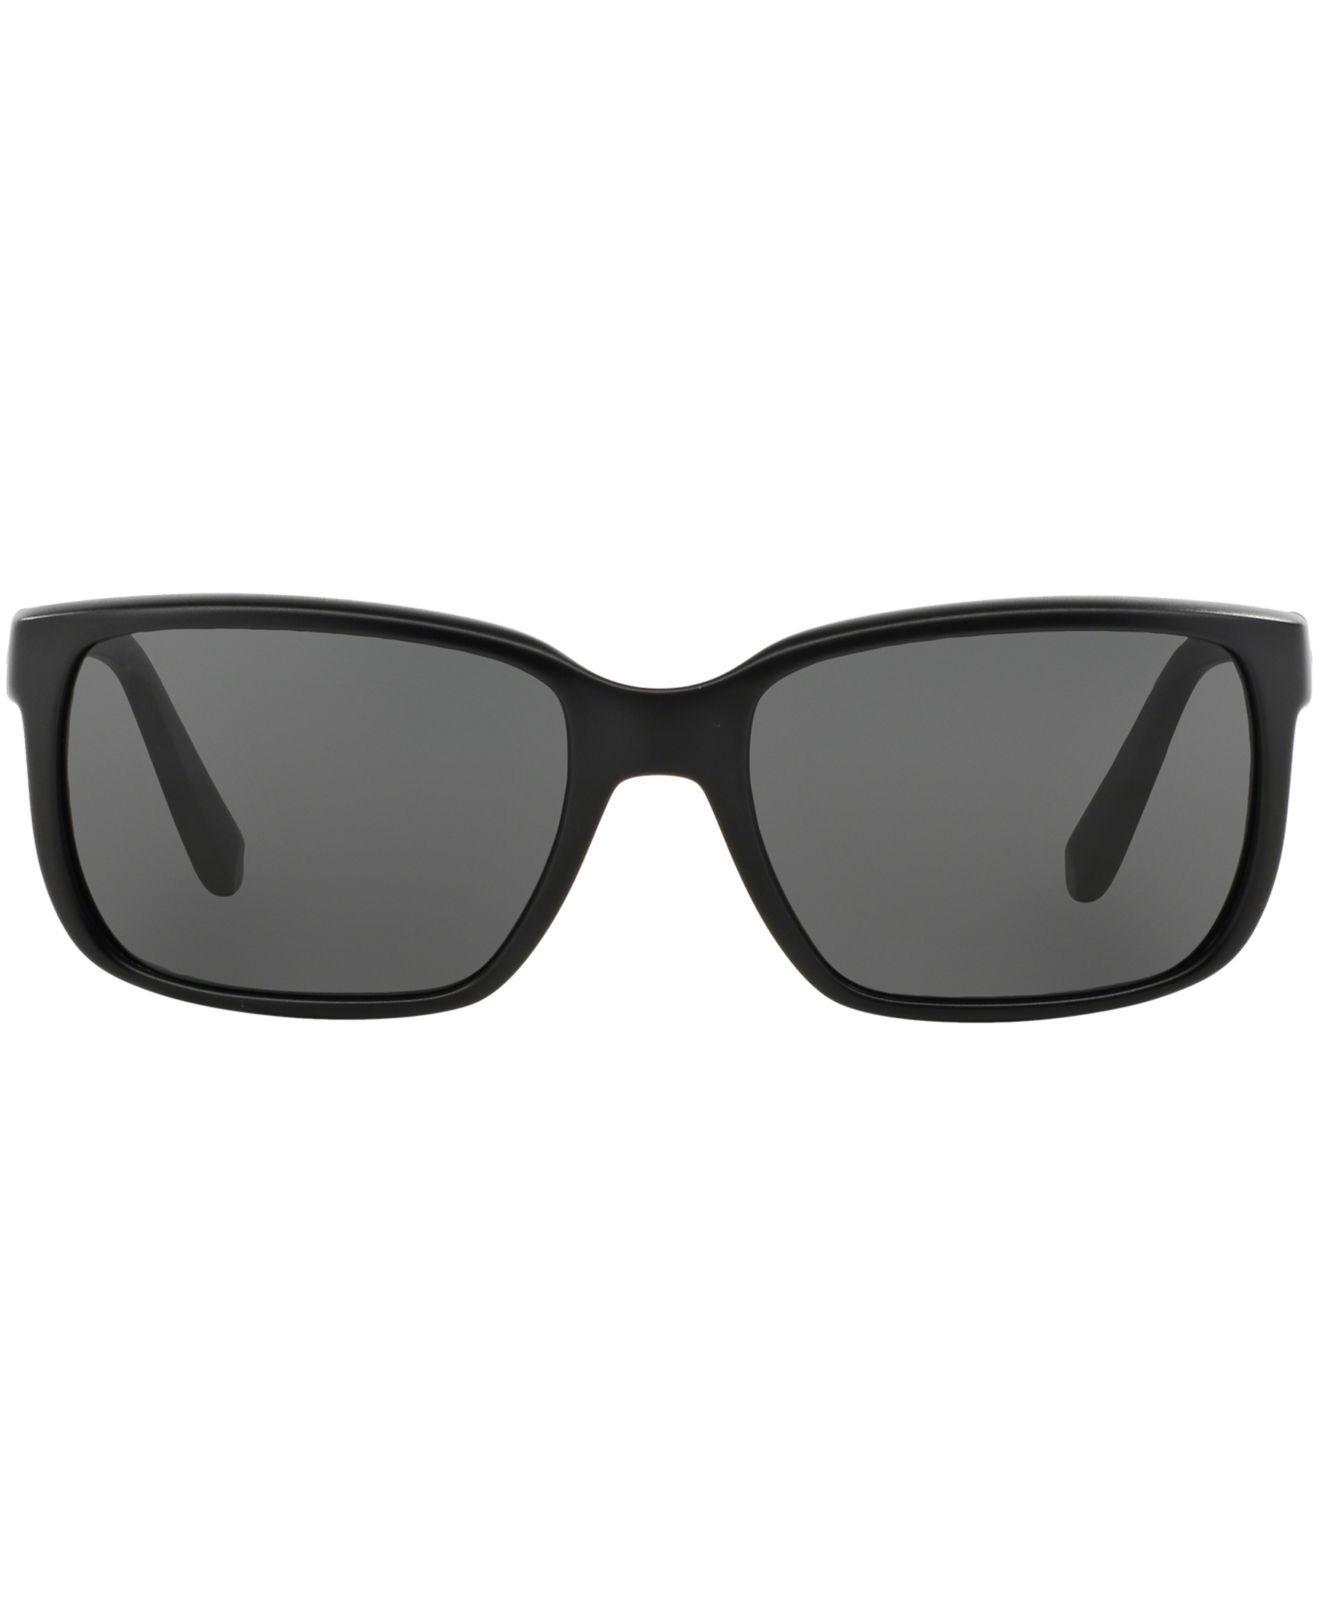 b627b8e2868 Lyst - Prada Sunglasses